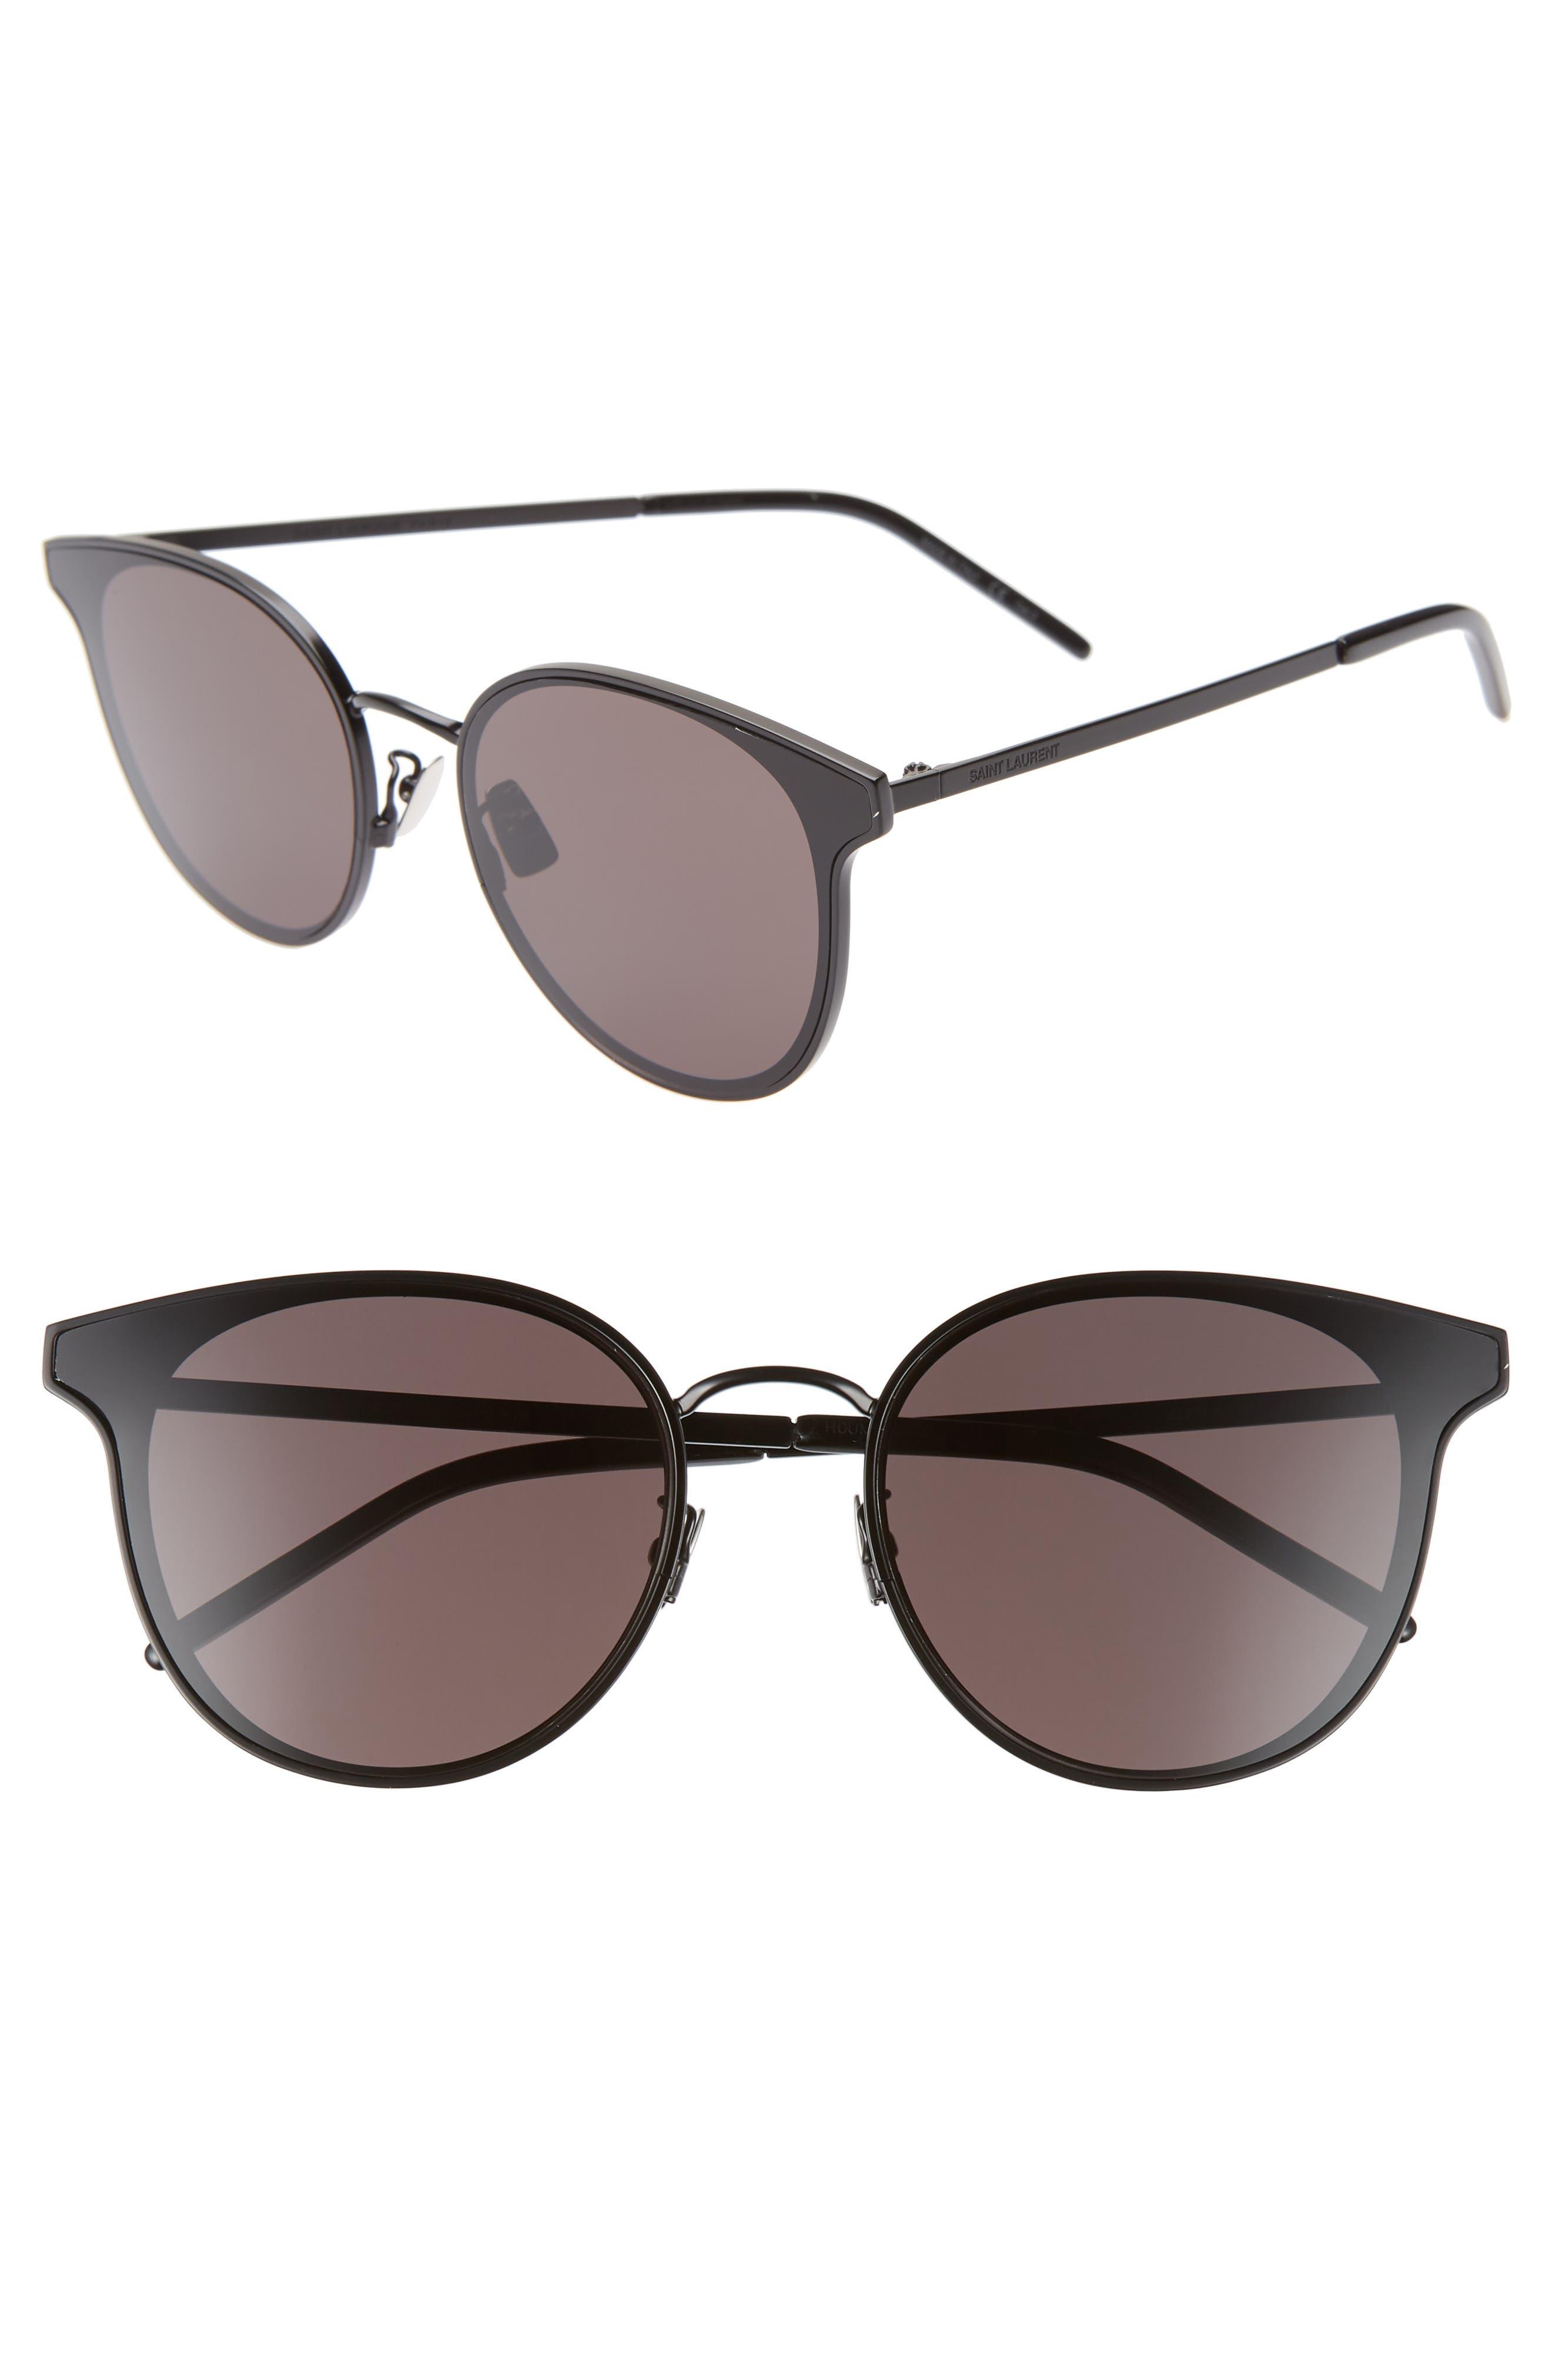 64mm Oversize Flat Front Round Sunglasses, Main, color, BLACK/ BLACK